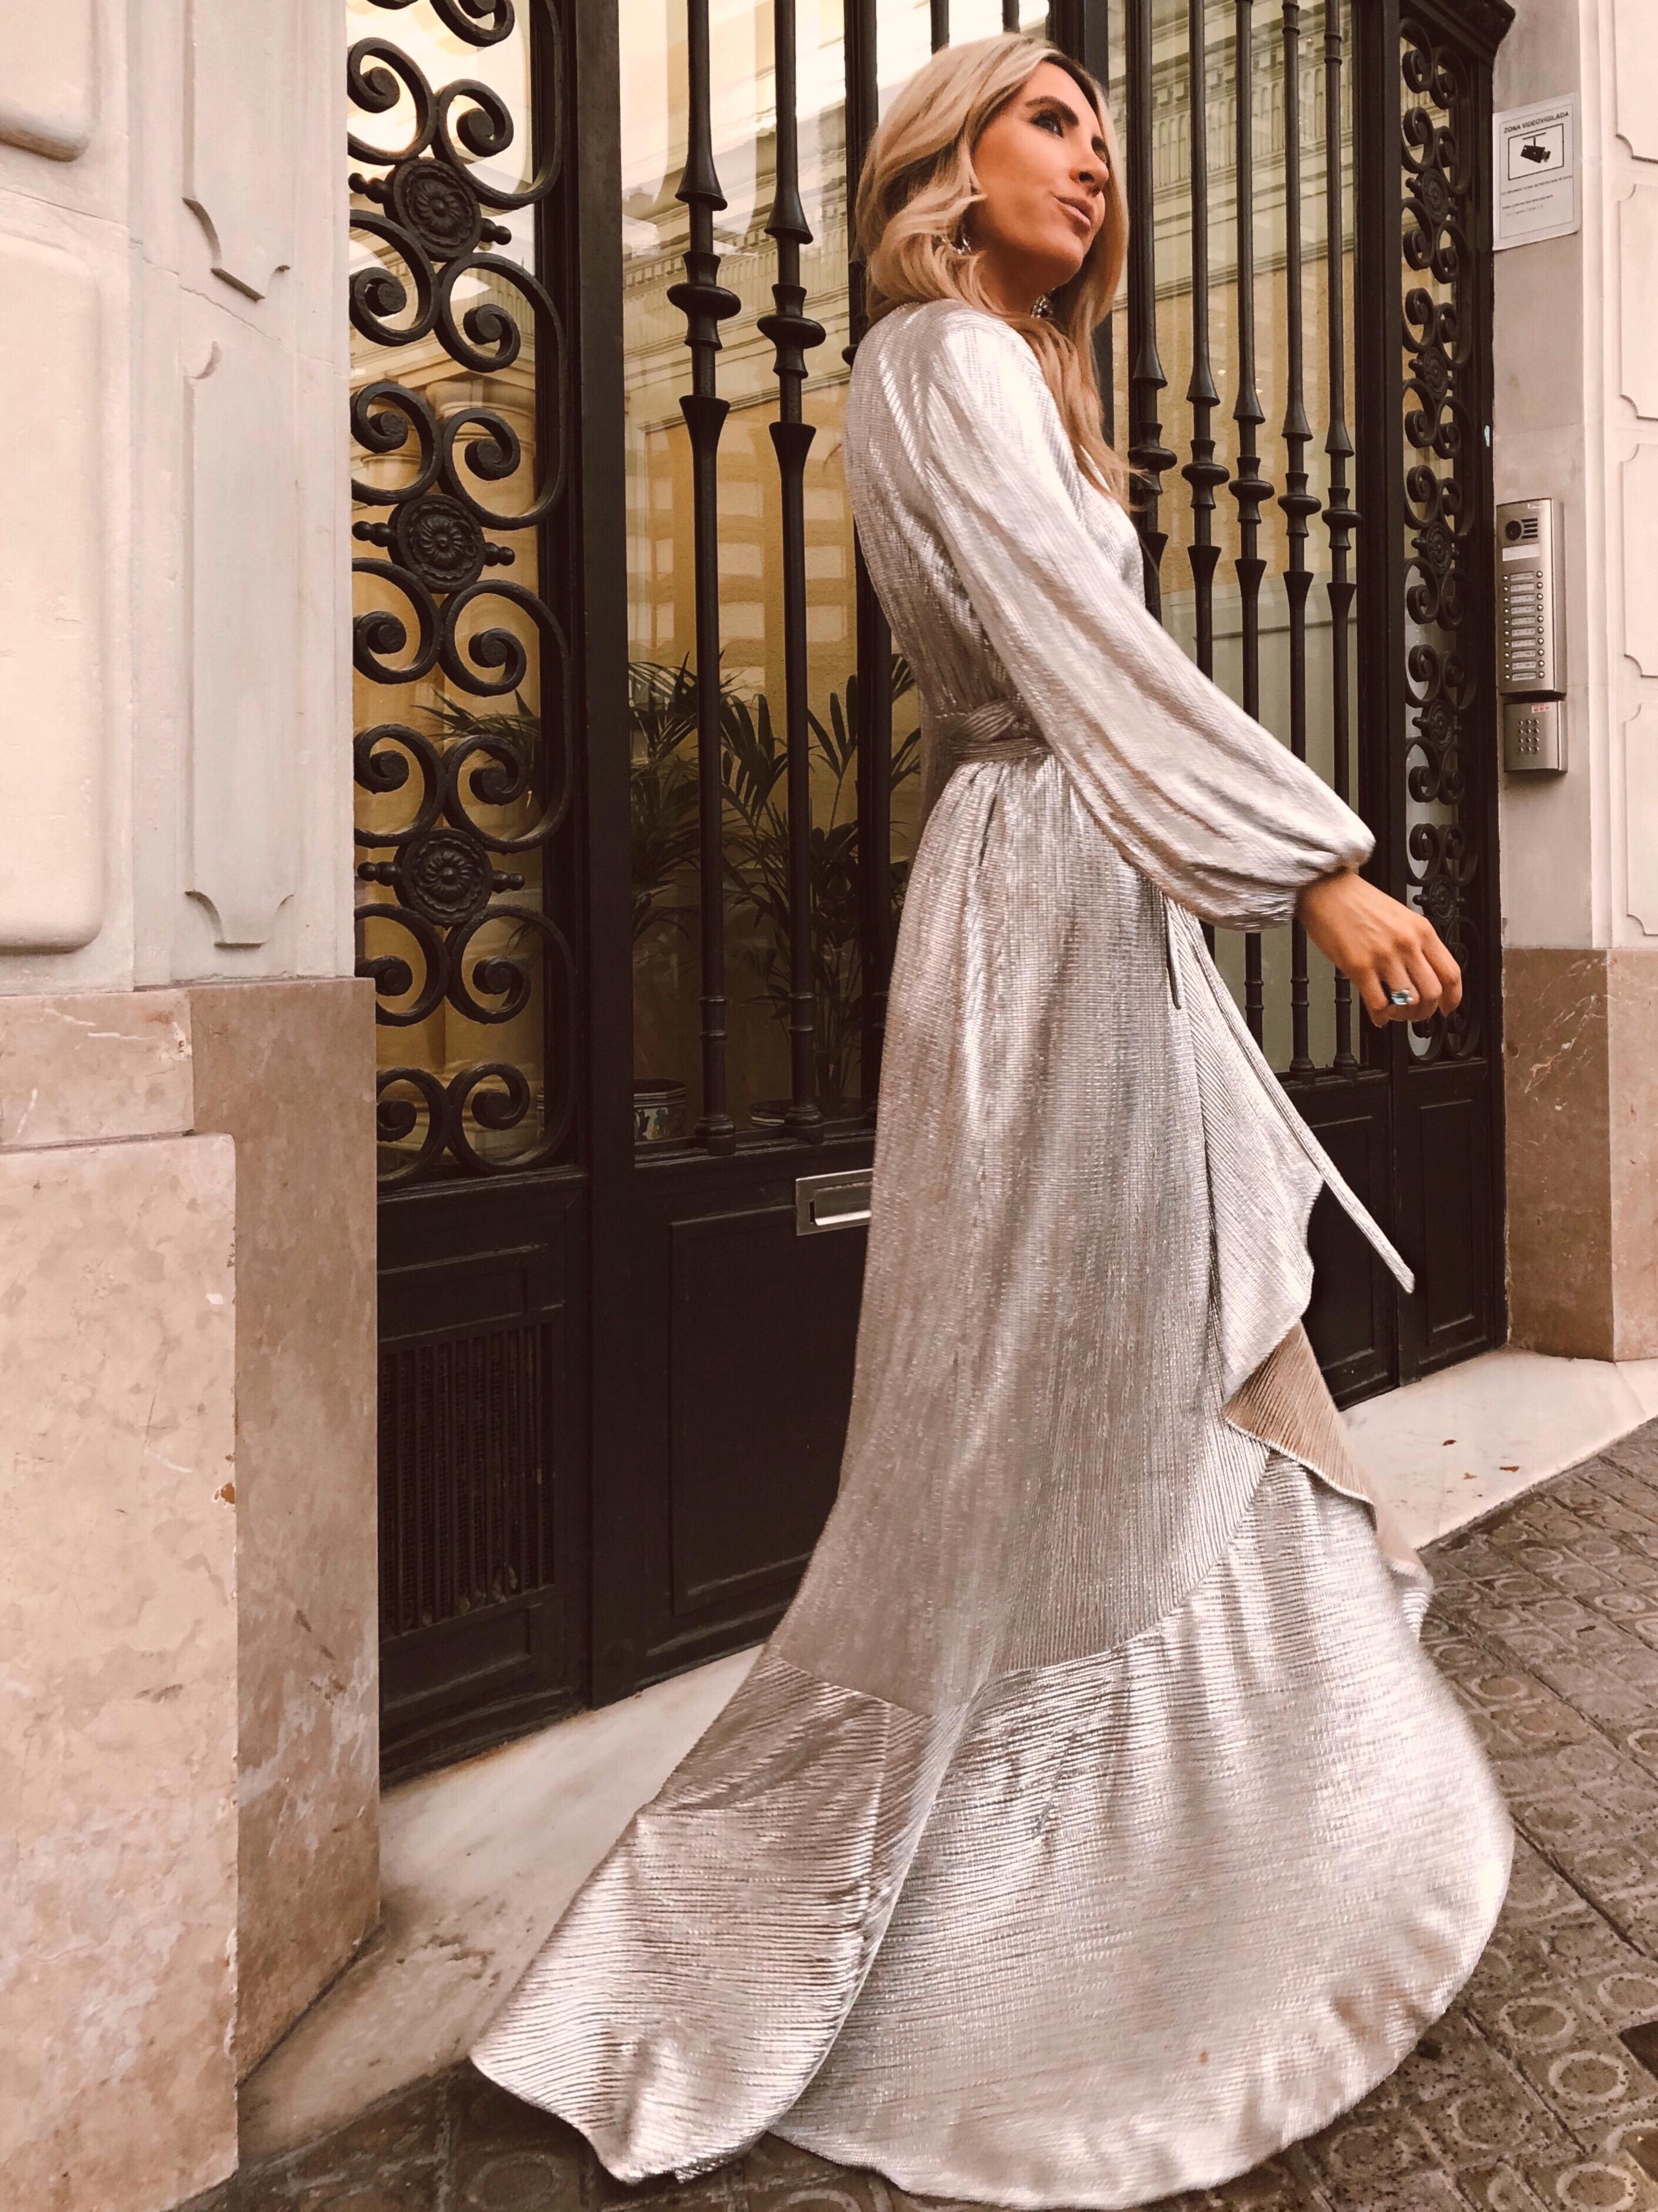 invitada-perfecta-en-bodas-influencer-looks-navidad-2019